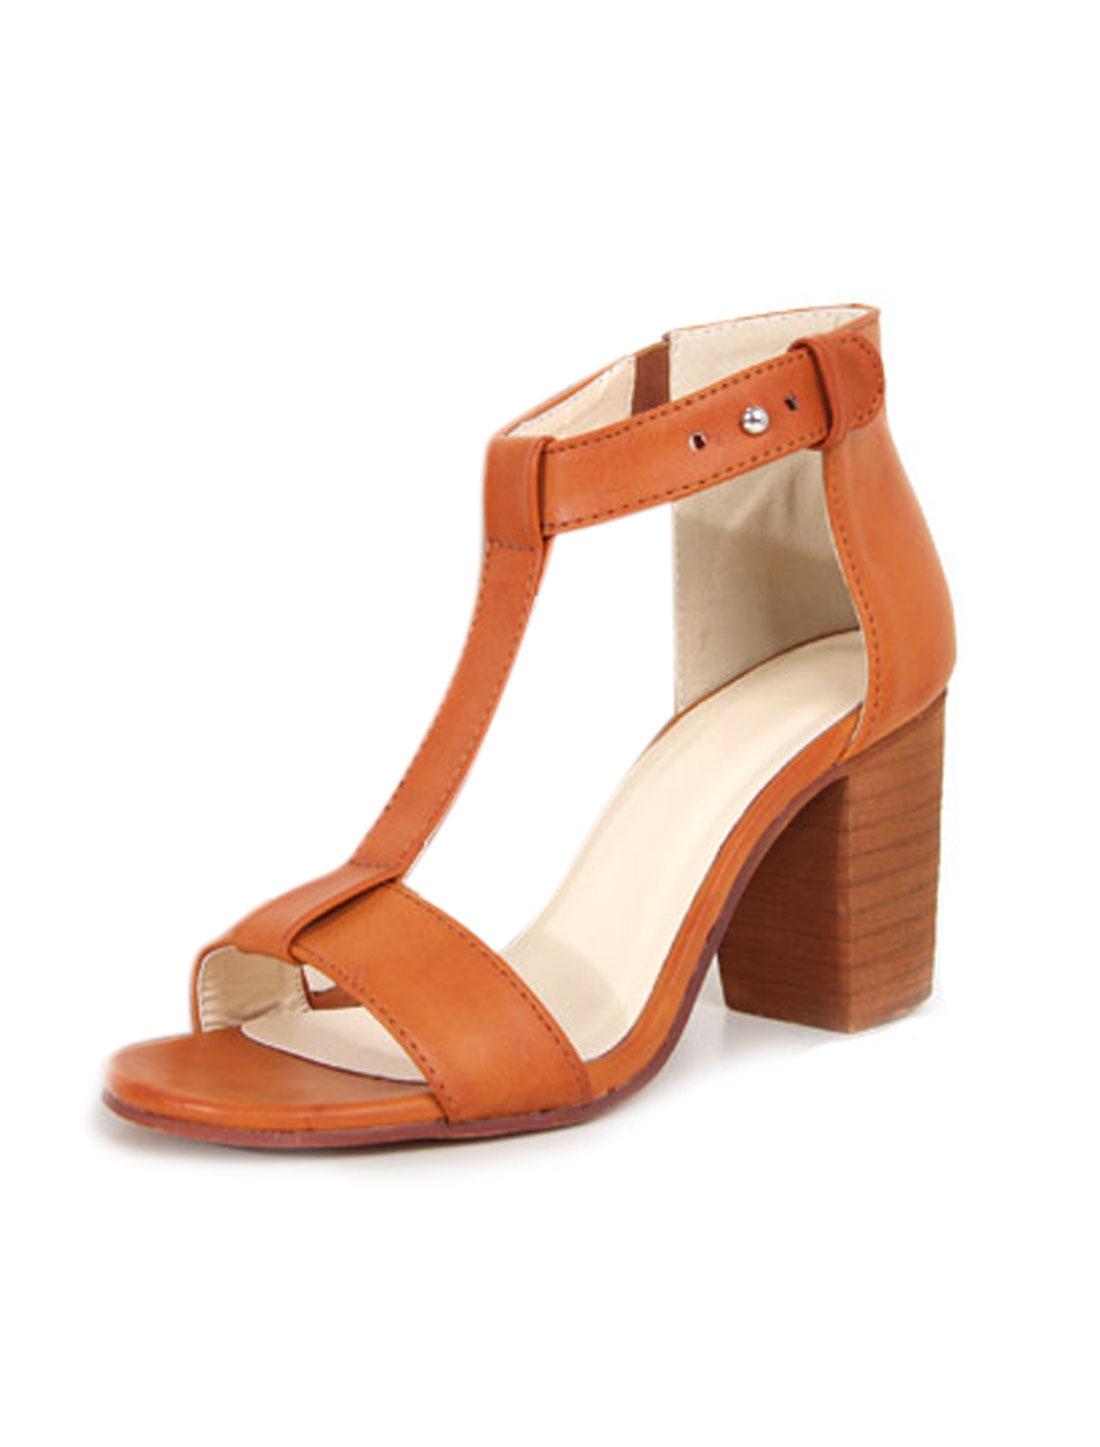 Women T-strap Button Stud Closure High Heels Sandals Brown US 6.5